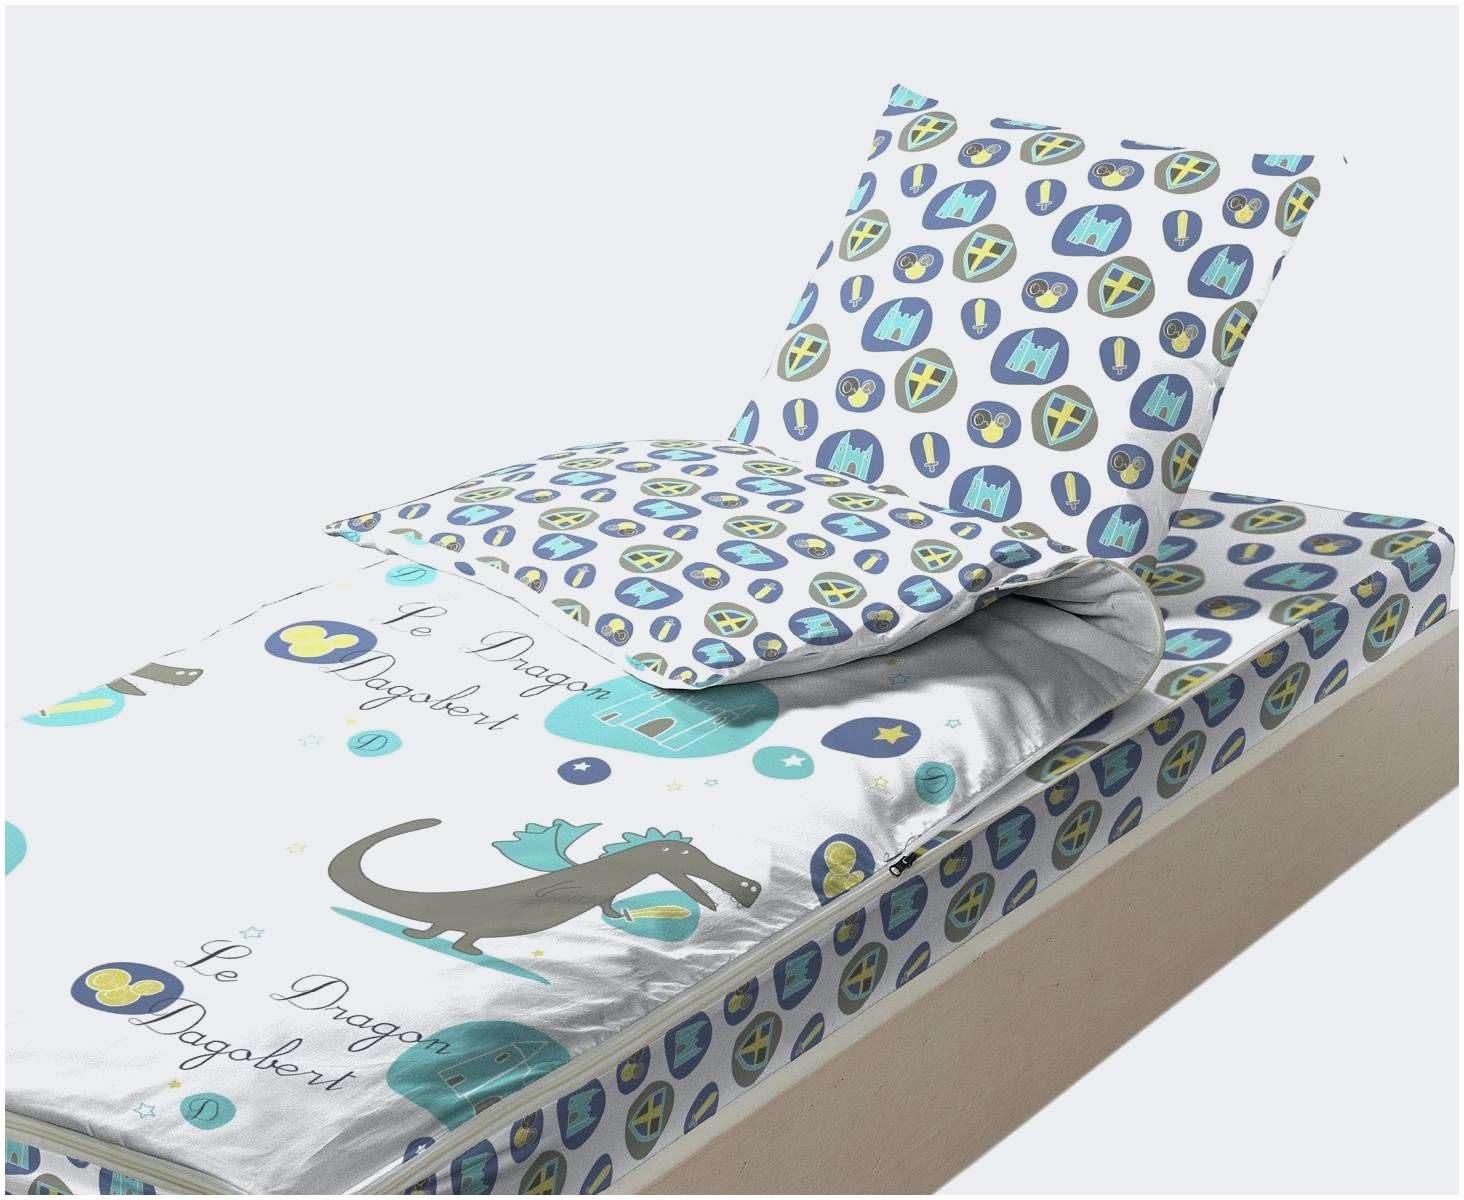 Lit Enfant 90×140 Beau Luxe Matelas Lit Evolutif 90—140 Luxe Bleu C¢lin Caradou Kit